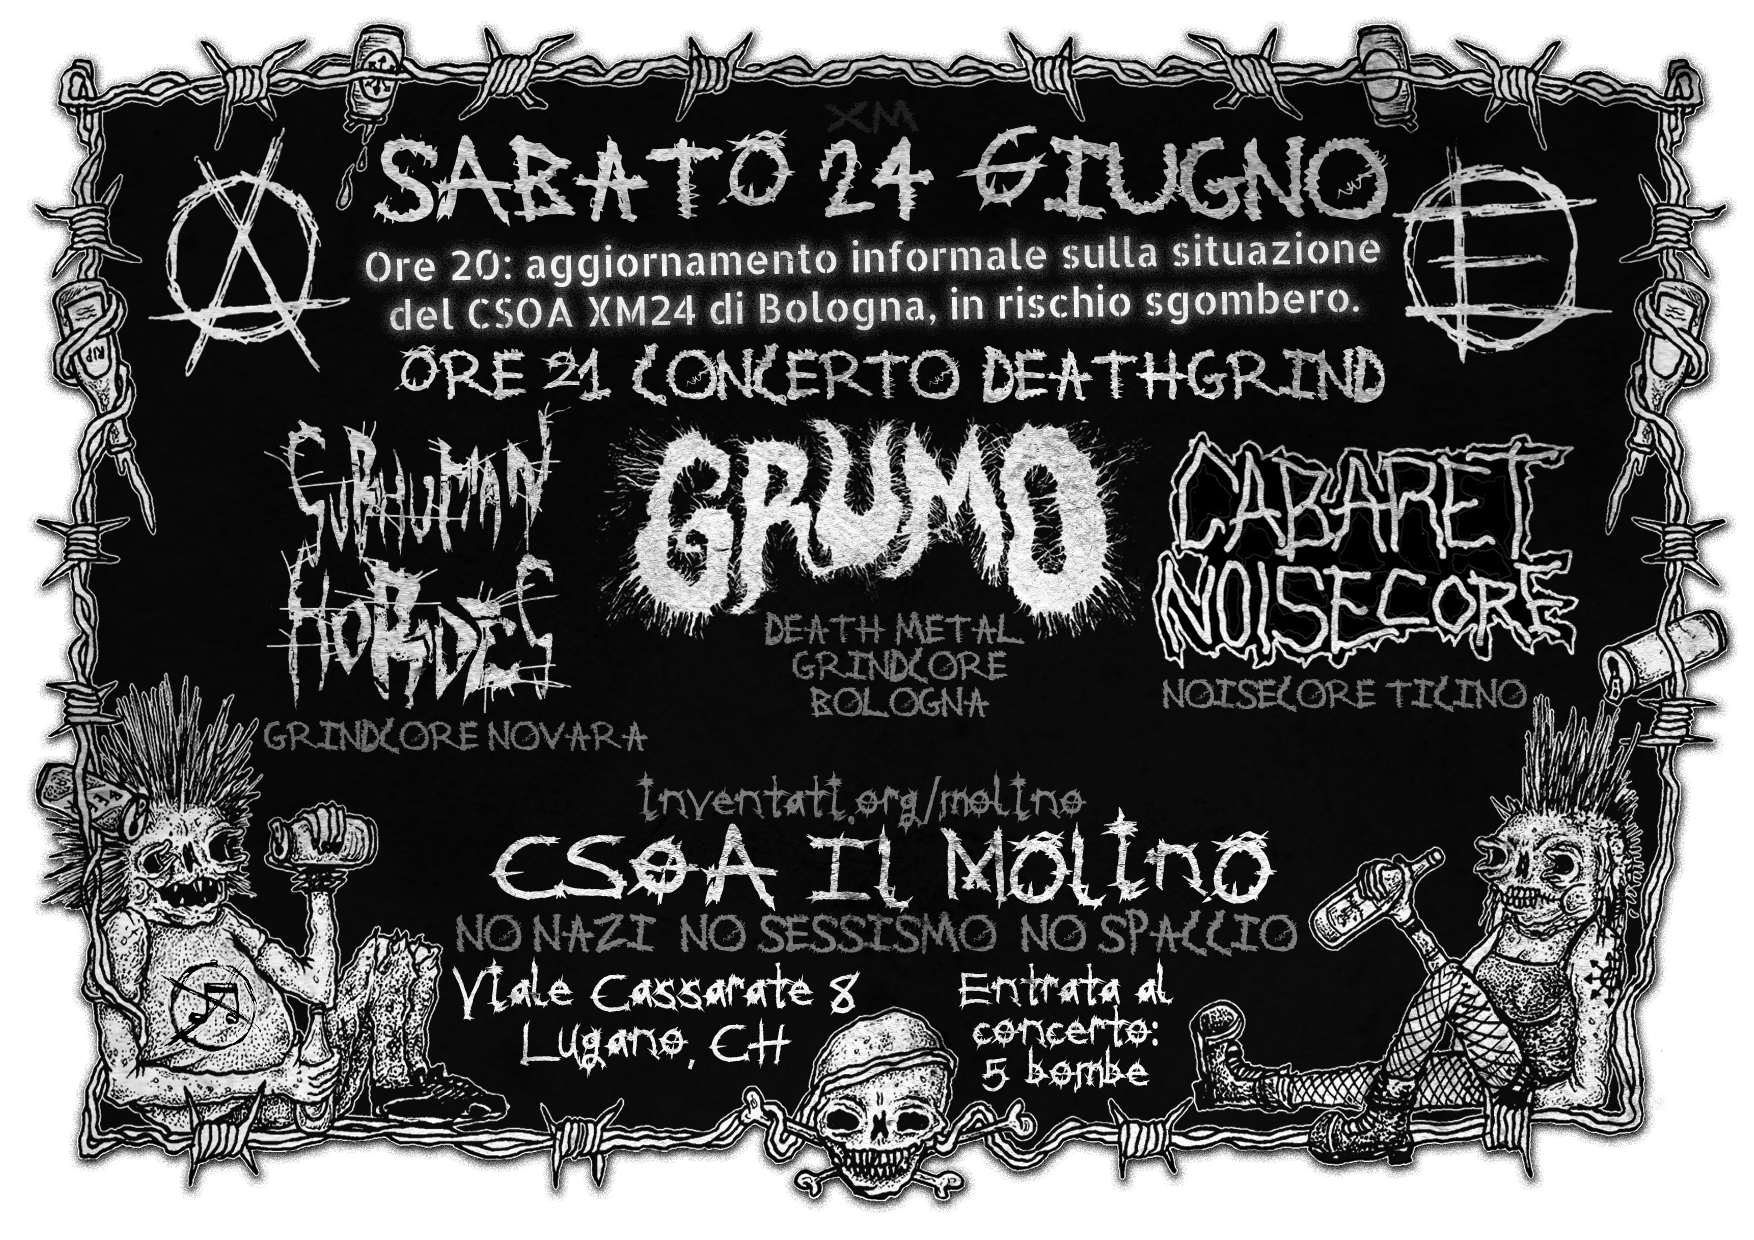 24.06.2017 - Grumo + Cabaret Noisecore - Concerto DeathGrind 1